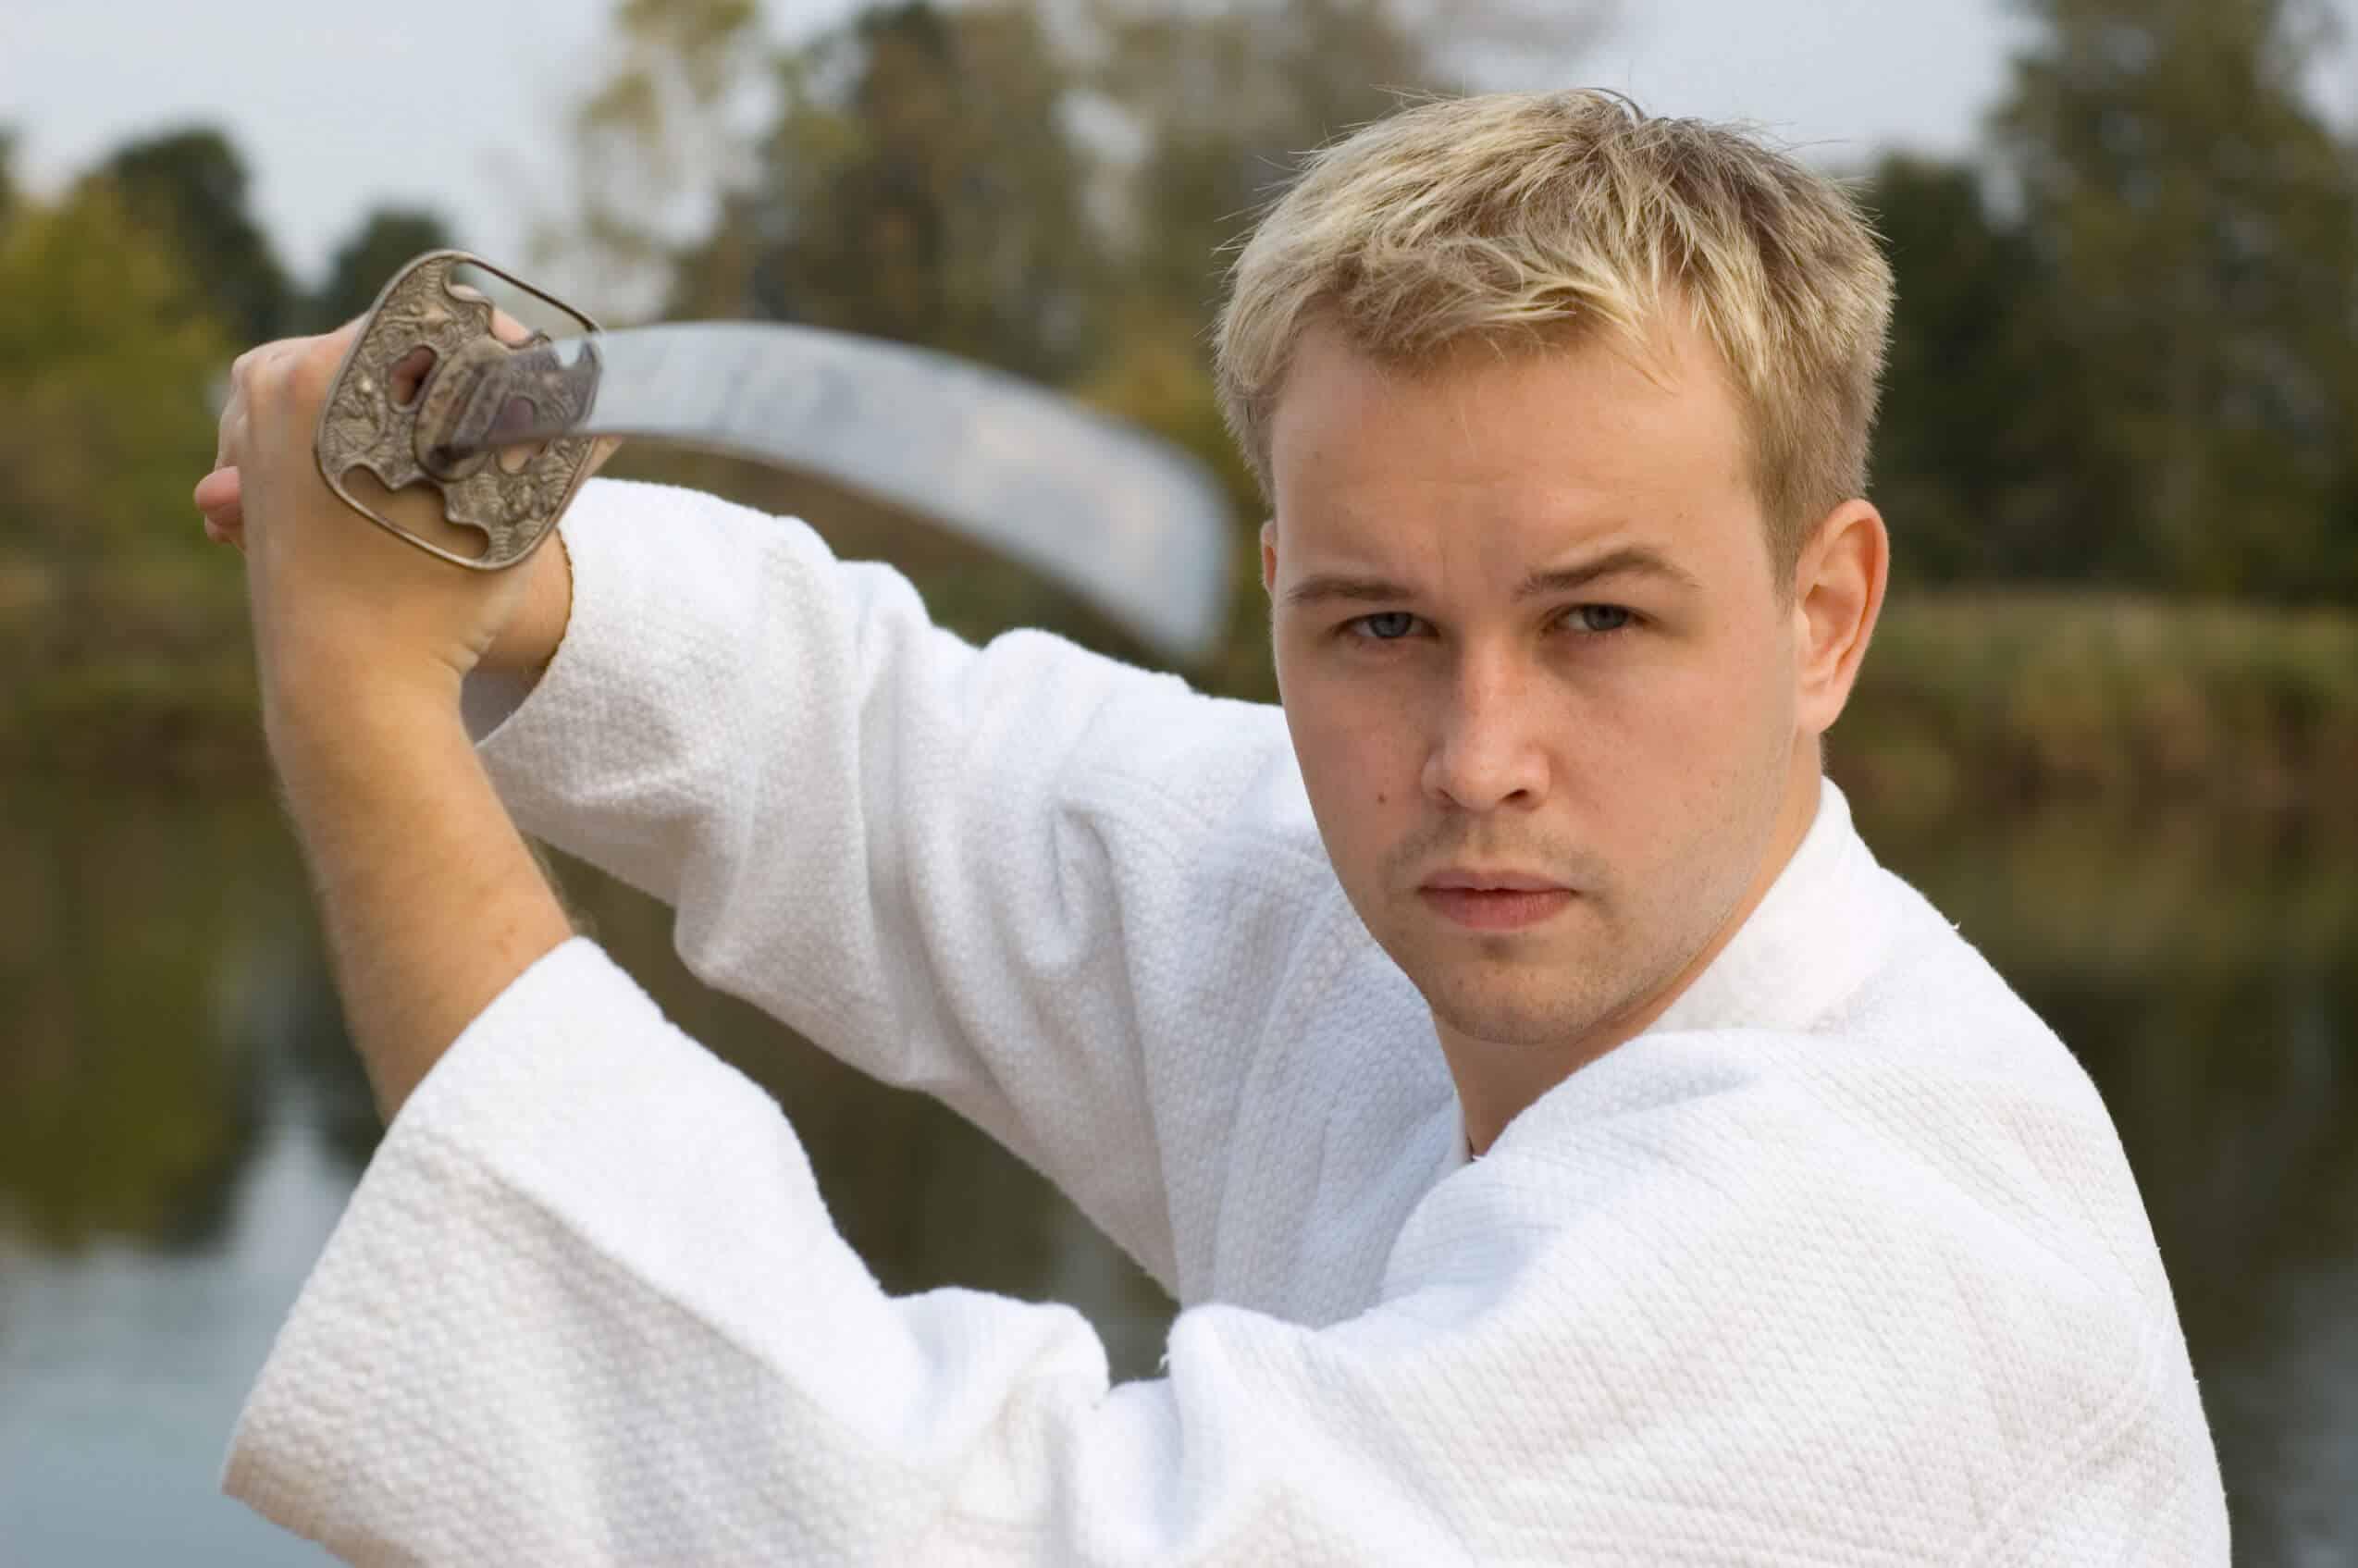 Martial Arts Lessons for Adults in Bayonne NJ - Samurai Sword Posing Blog